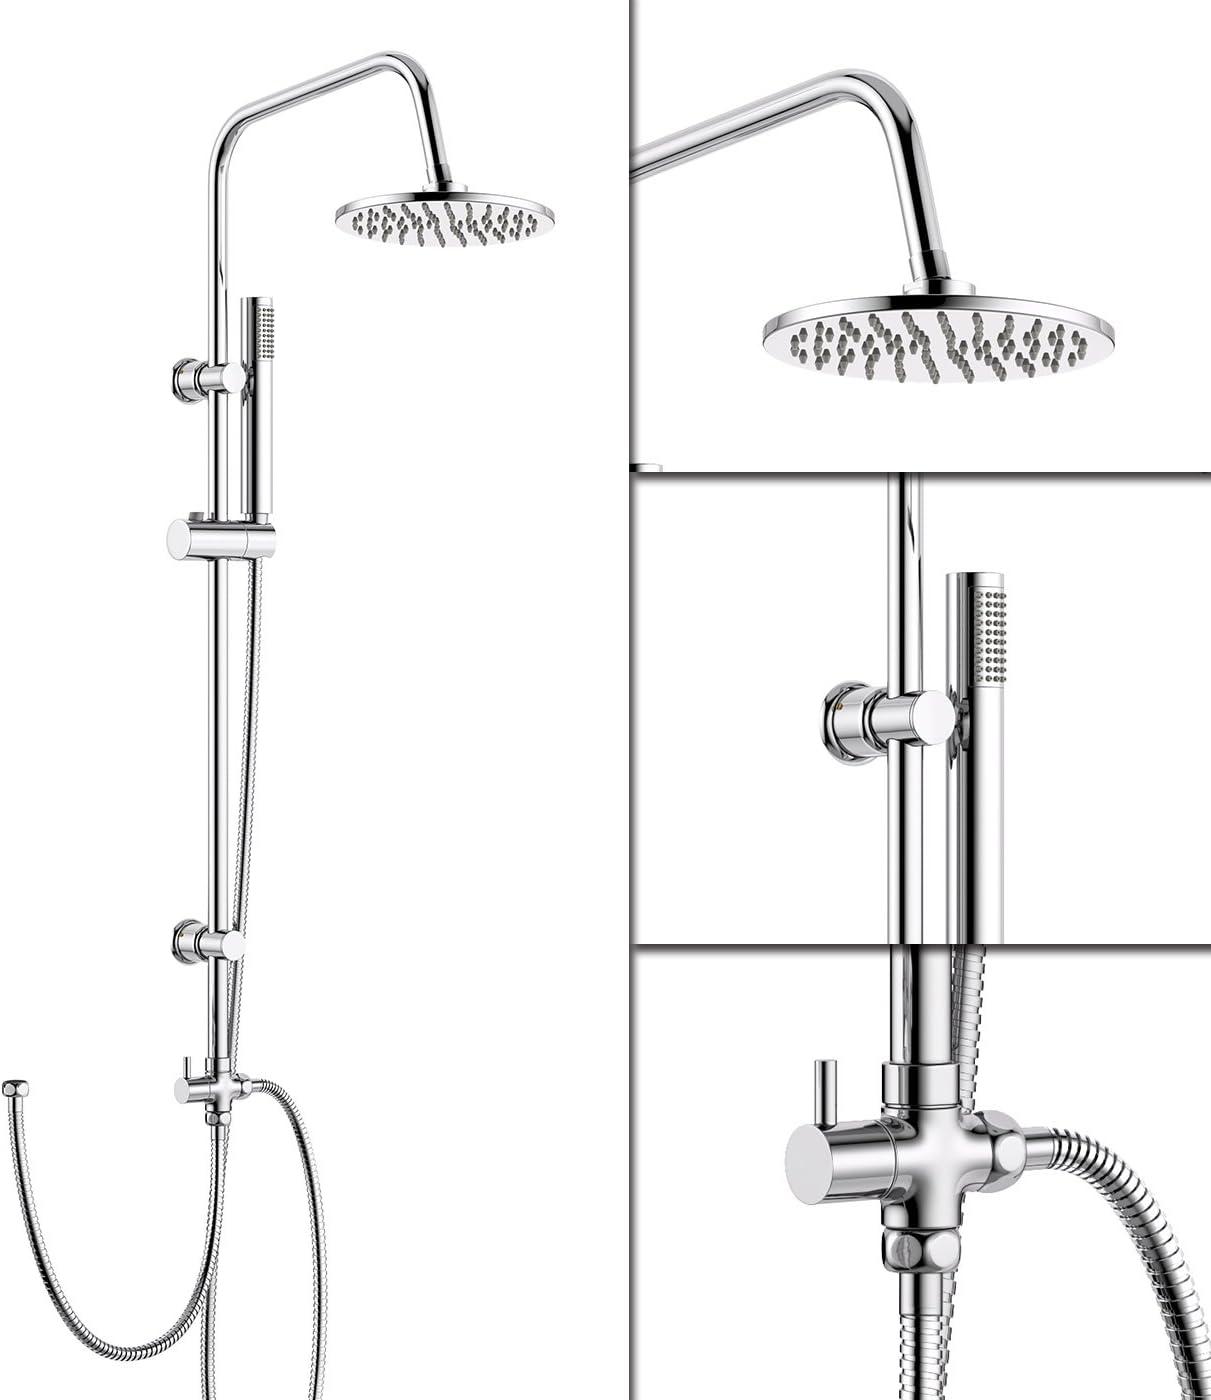 iBathUK | Modern Chrome Riser Rail Mixer Round Shower Head Kit for Bath Tap SP5105